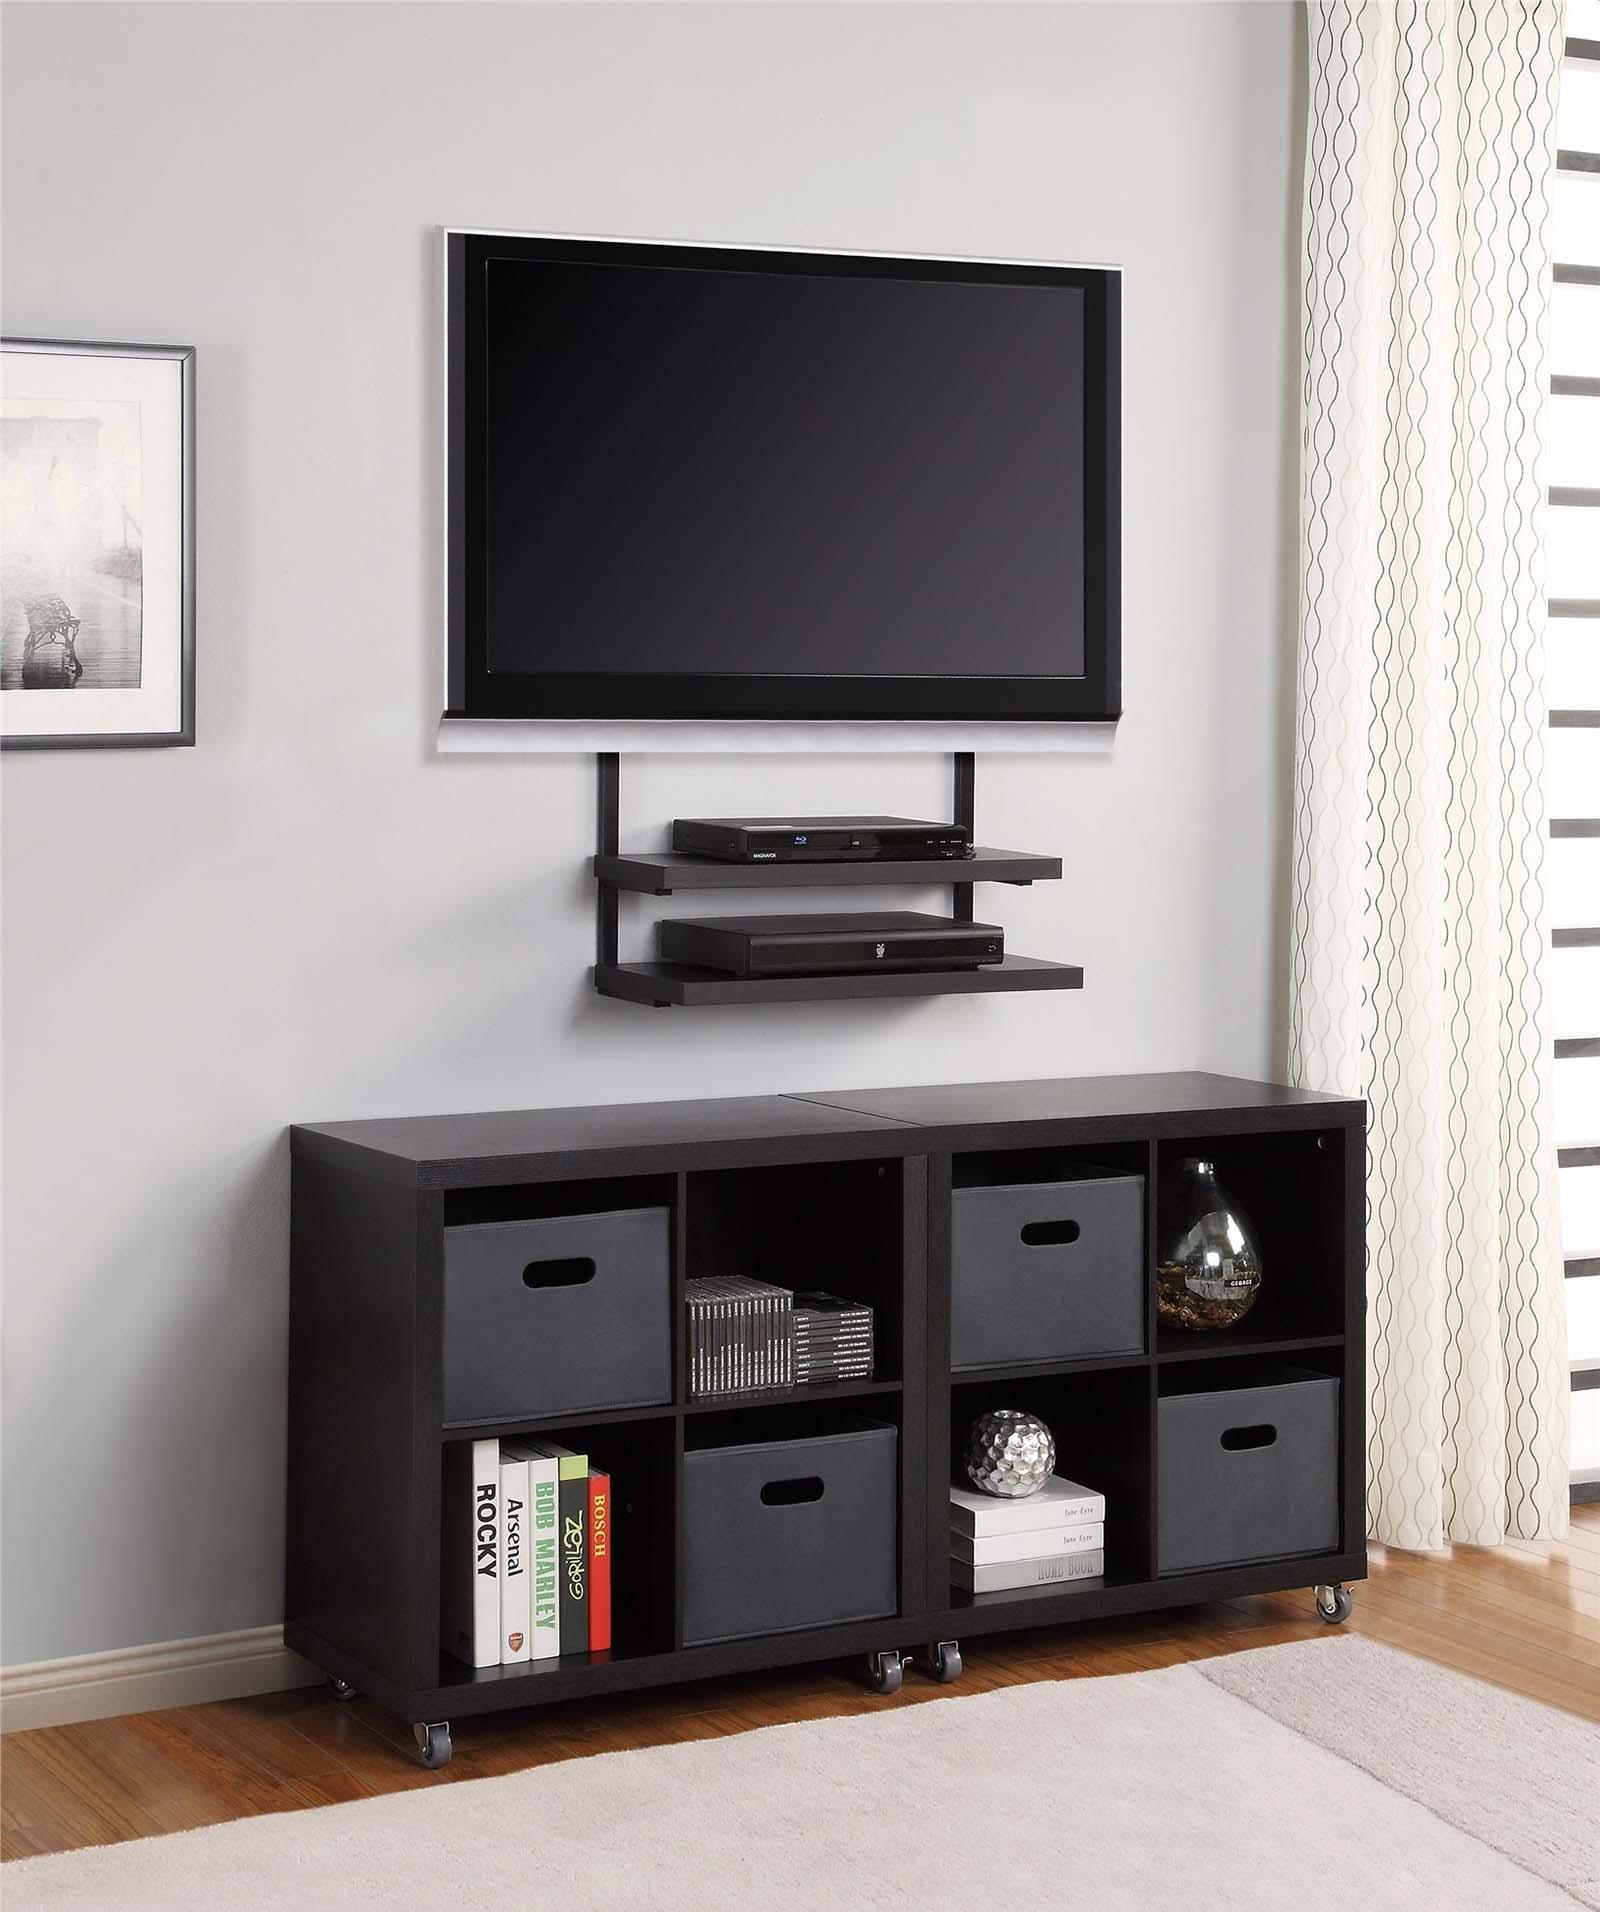 Wall-Mounted TV with Black Racks